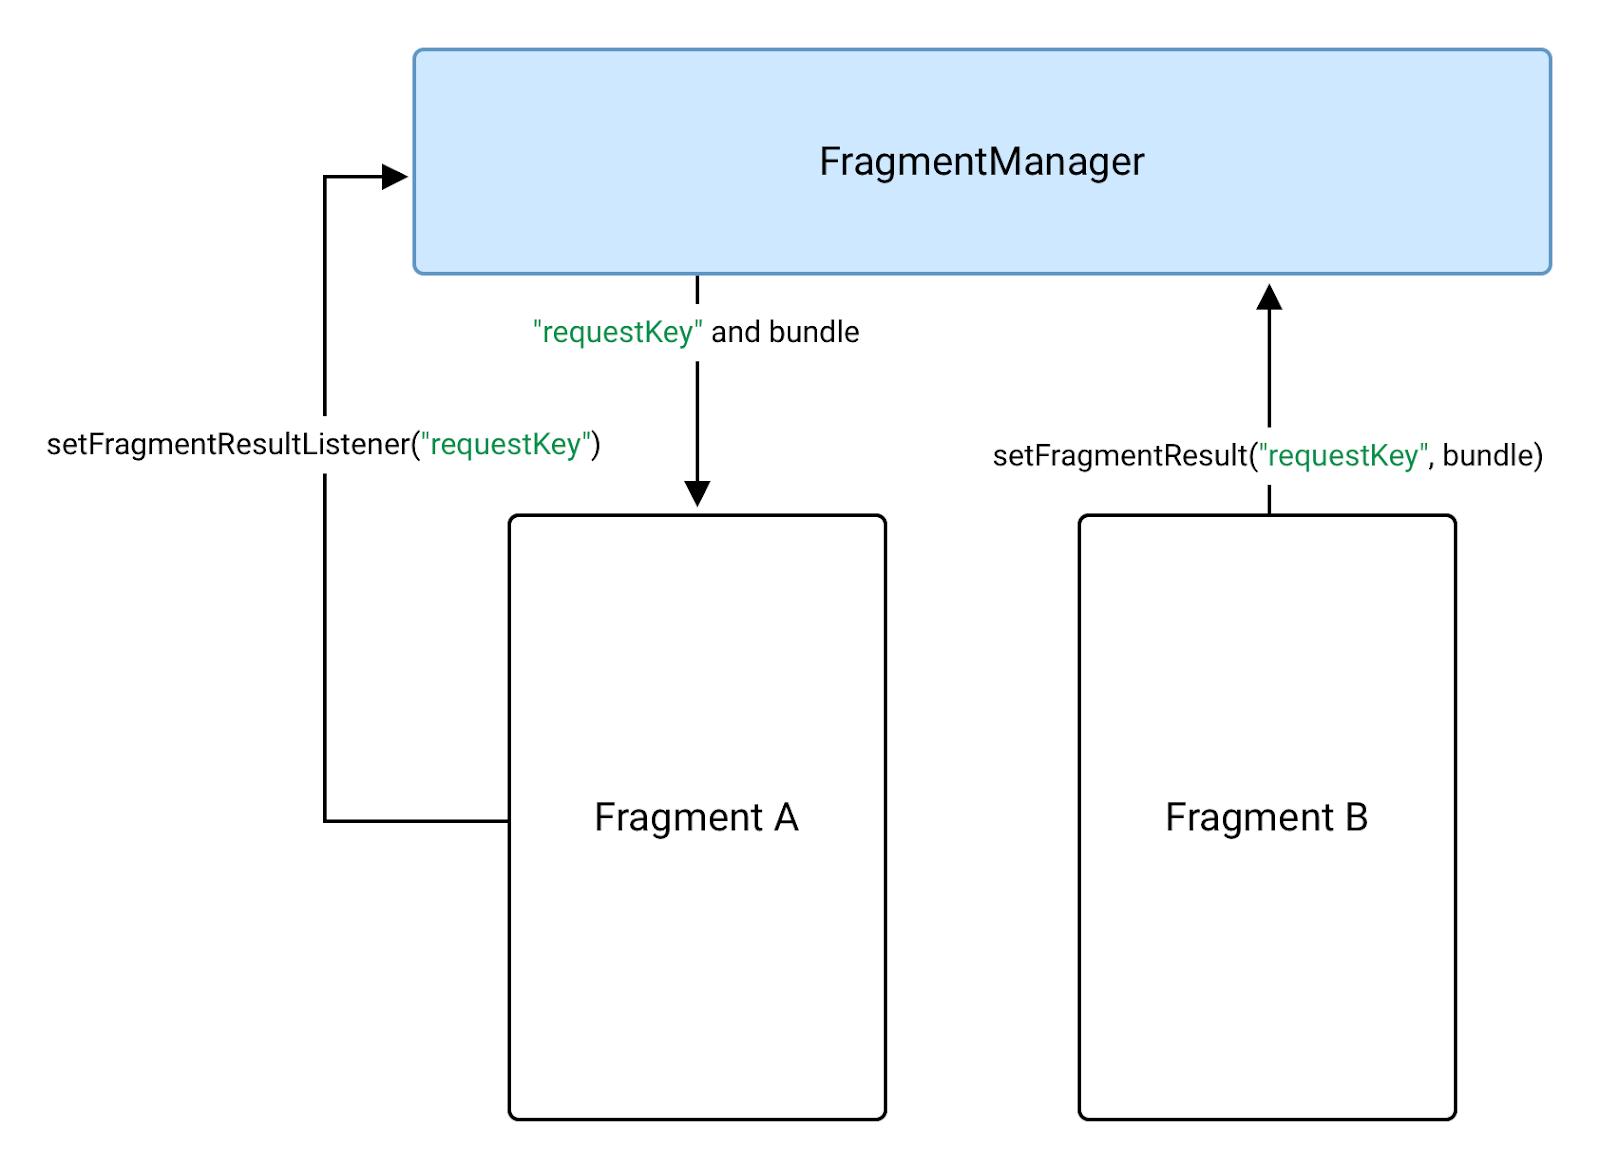 El fragmentob envía datos al fragmentoa por medio de un FragmentManager